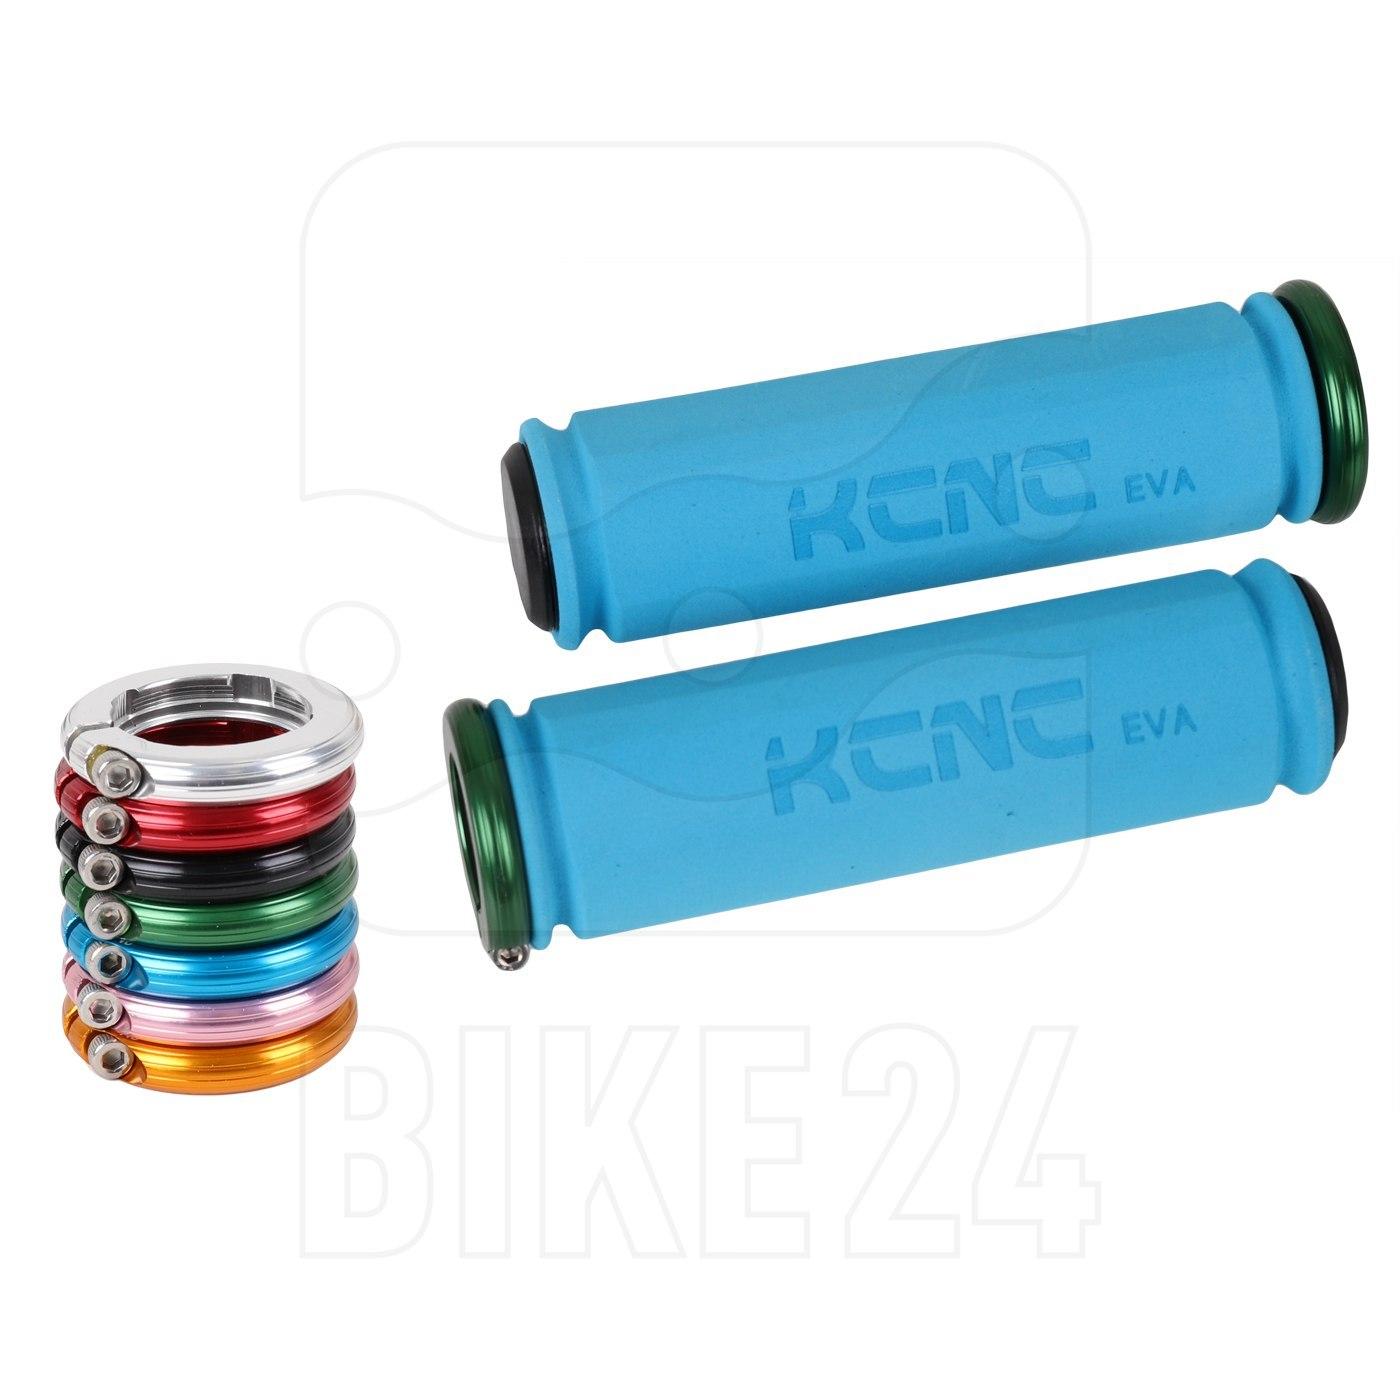 KCNC Lock-on Lenkergriffe mit Lockring - blau/farbig